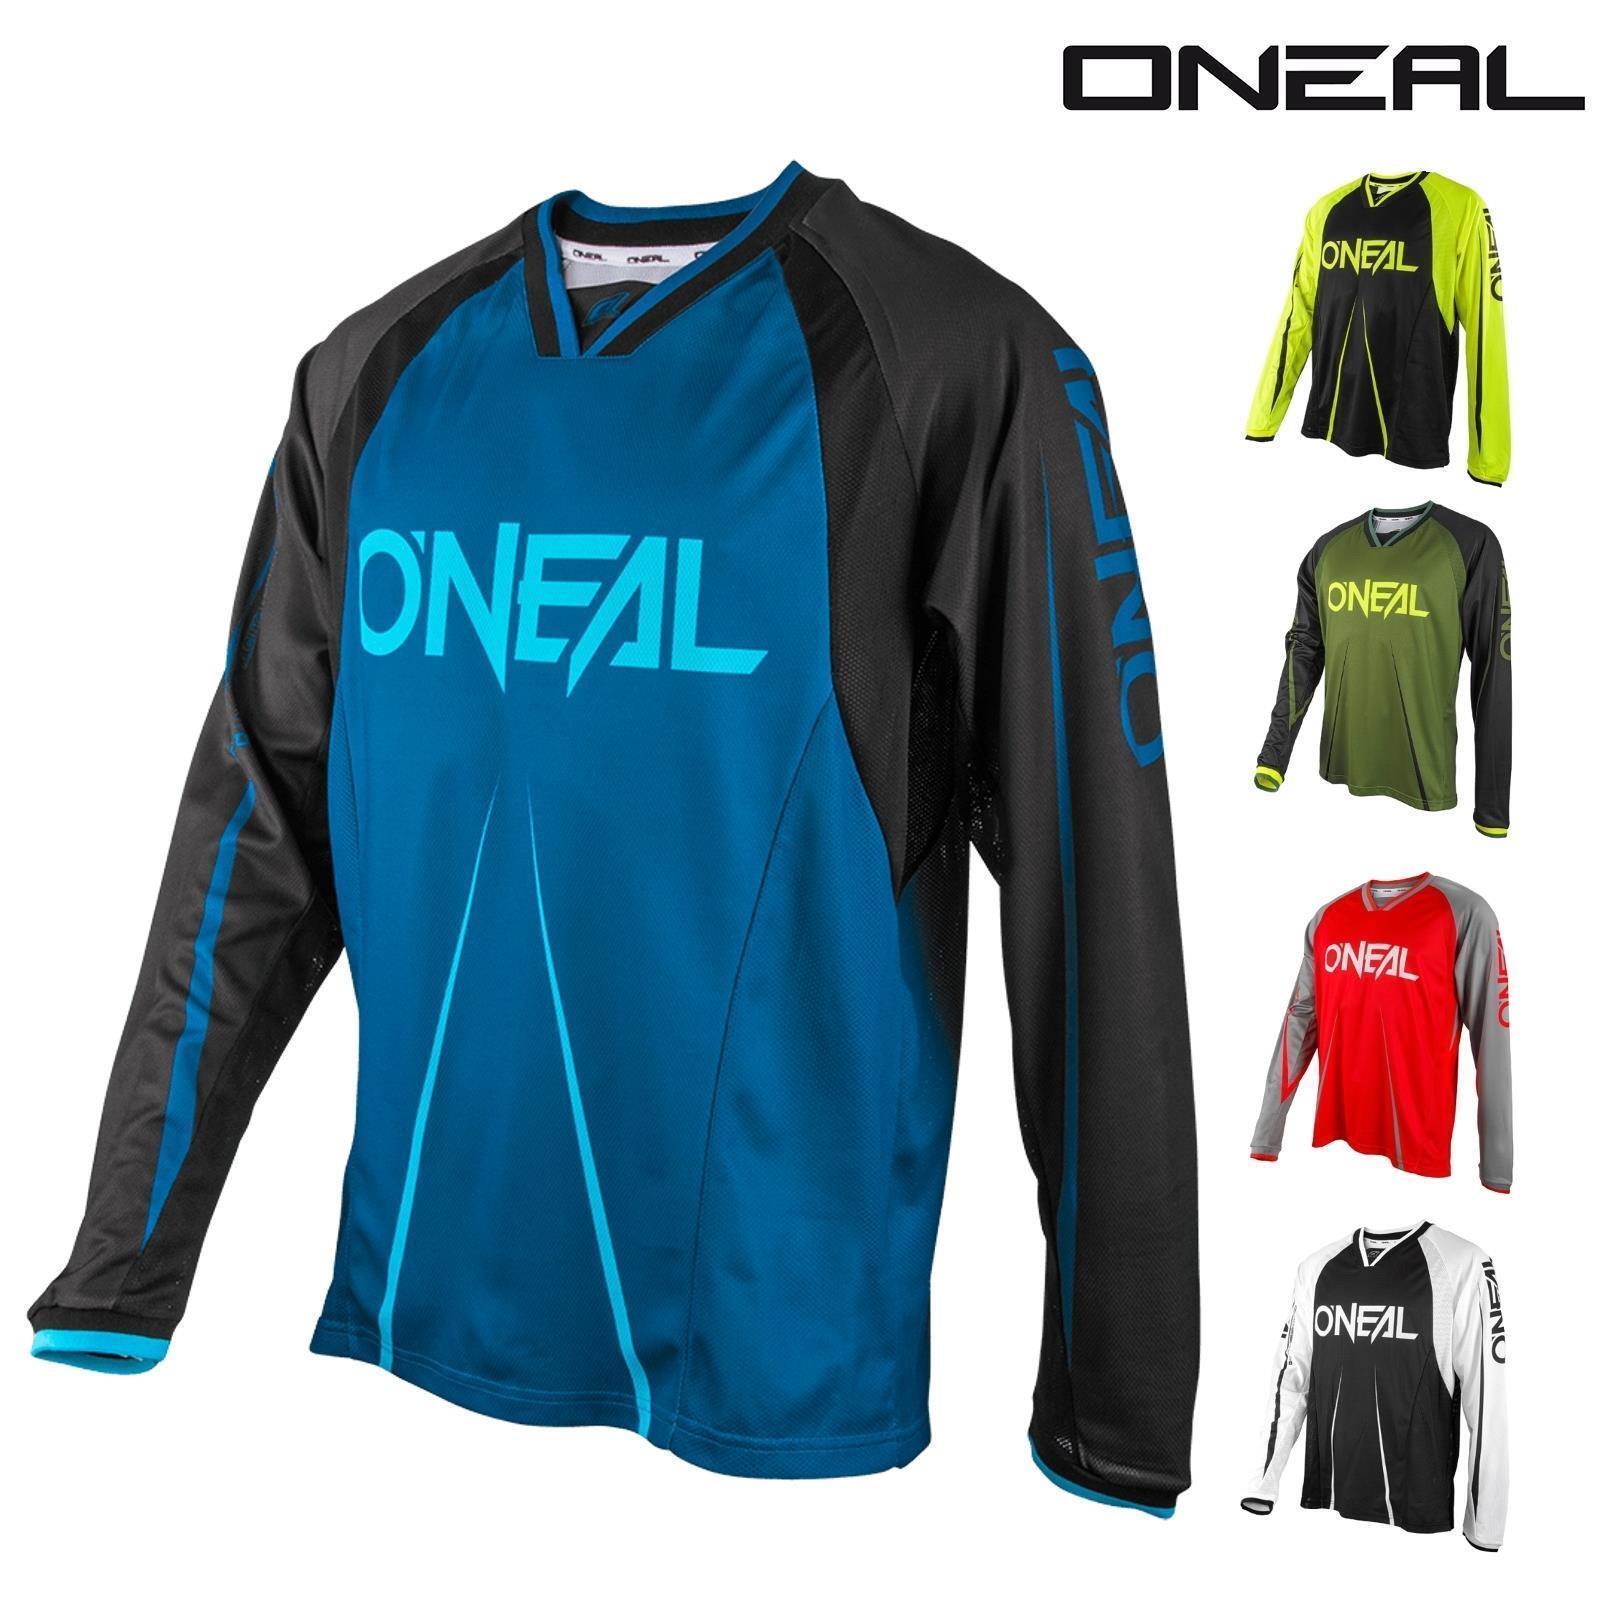 O'Neal EleMänt FR Fahrrad Trikot Shirt Jersey DH Downhill Freeride Mountain Cykel